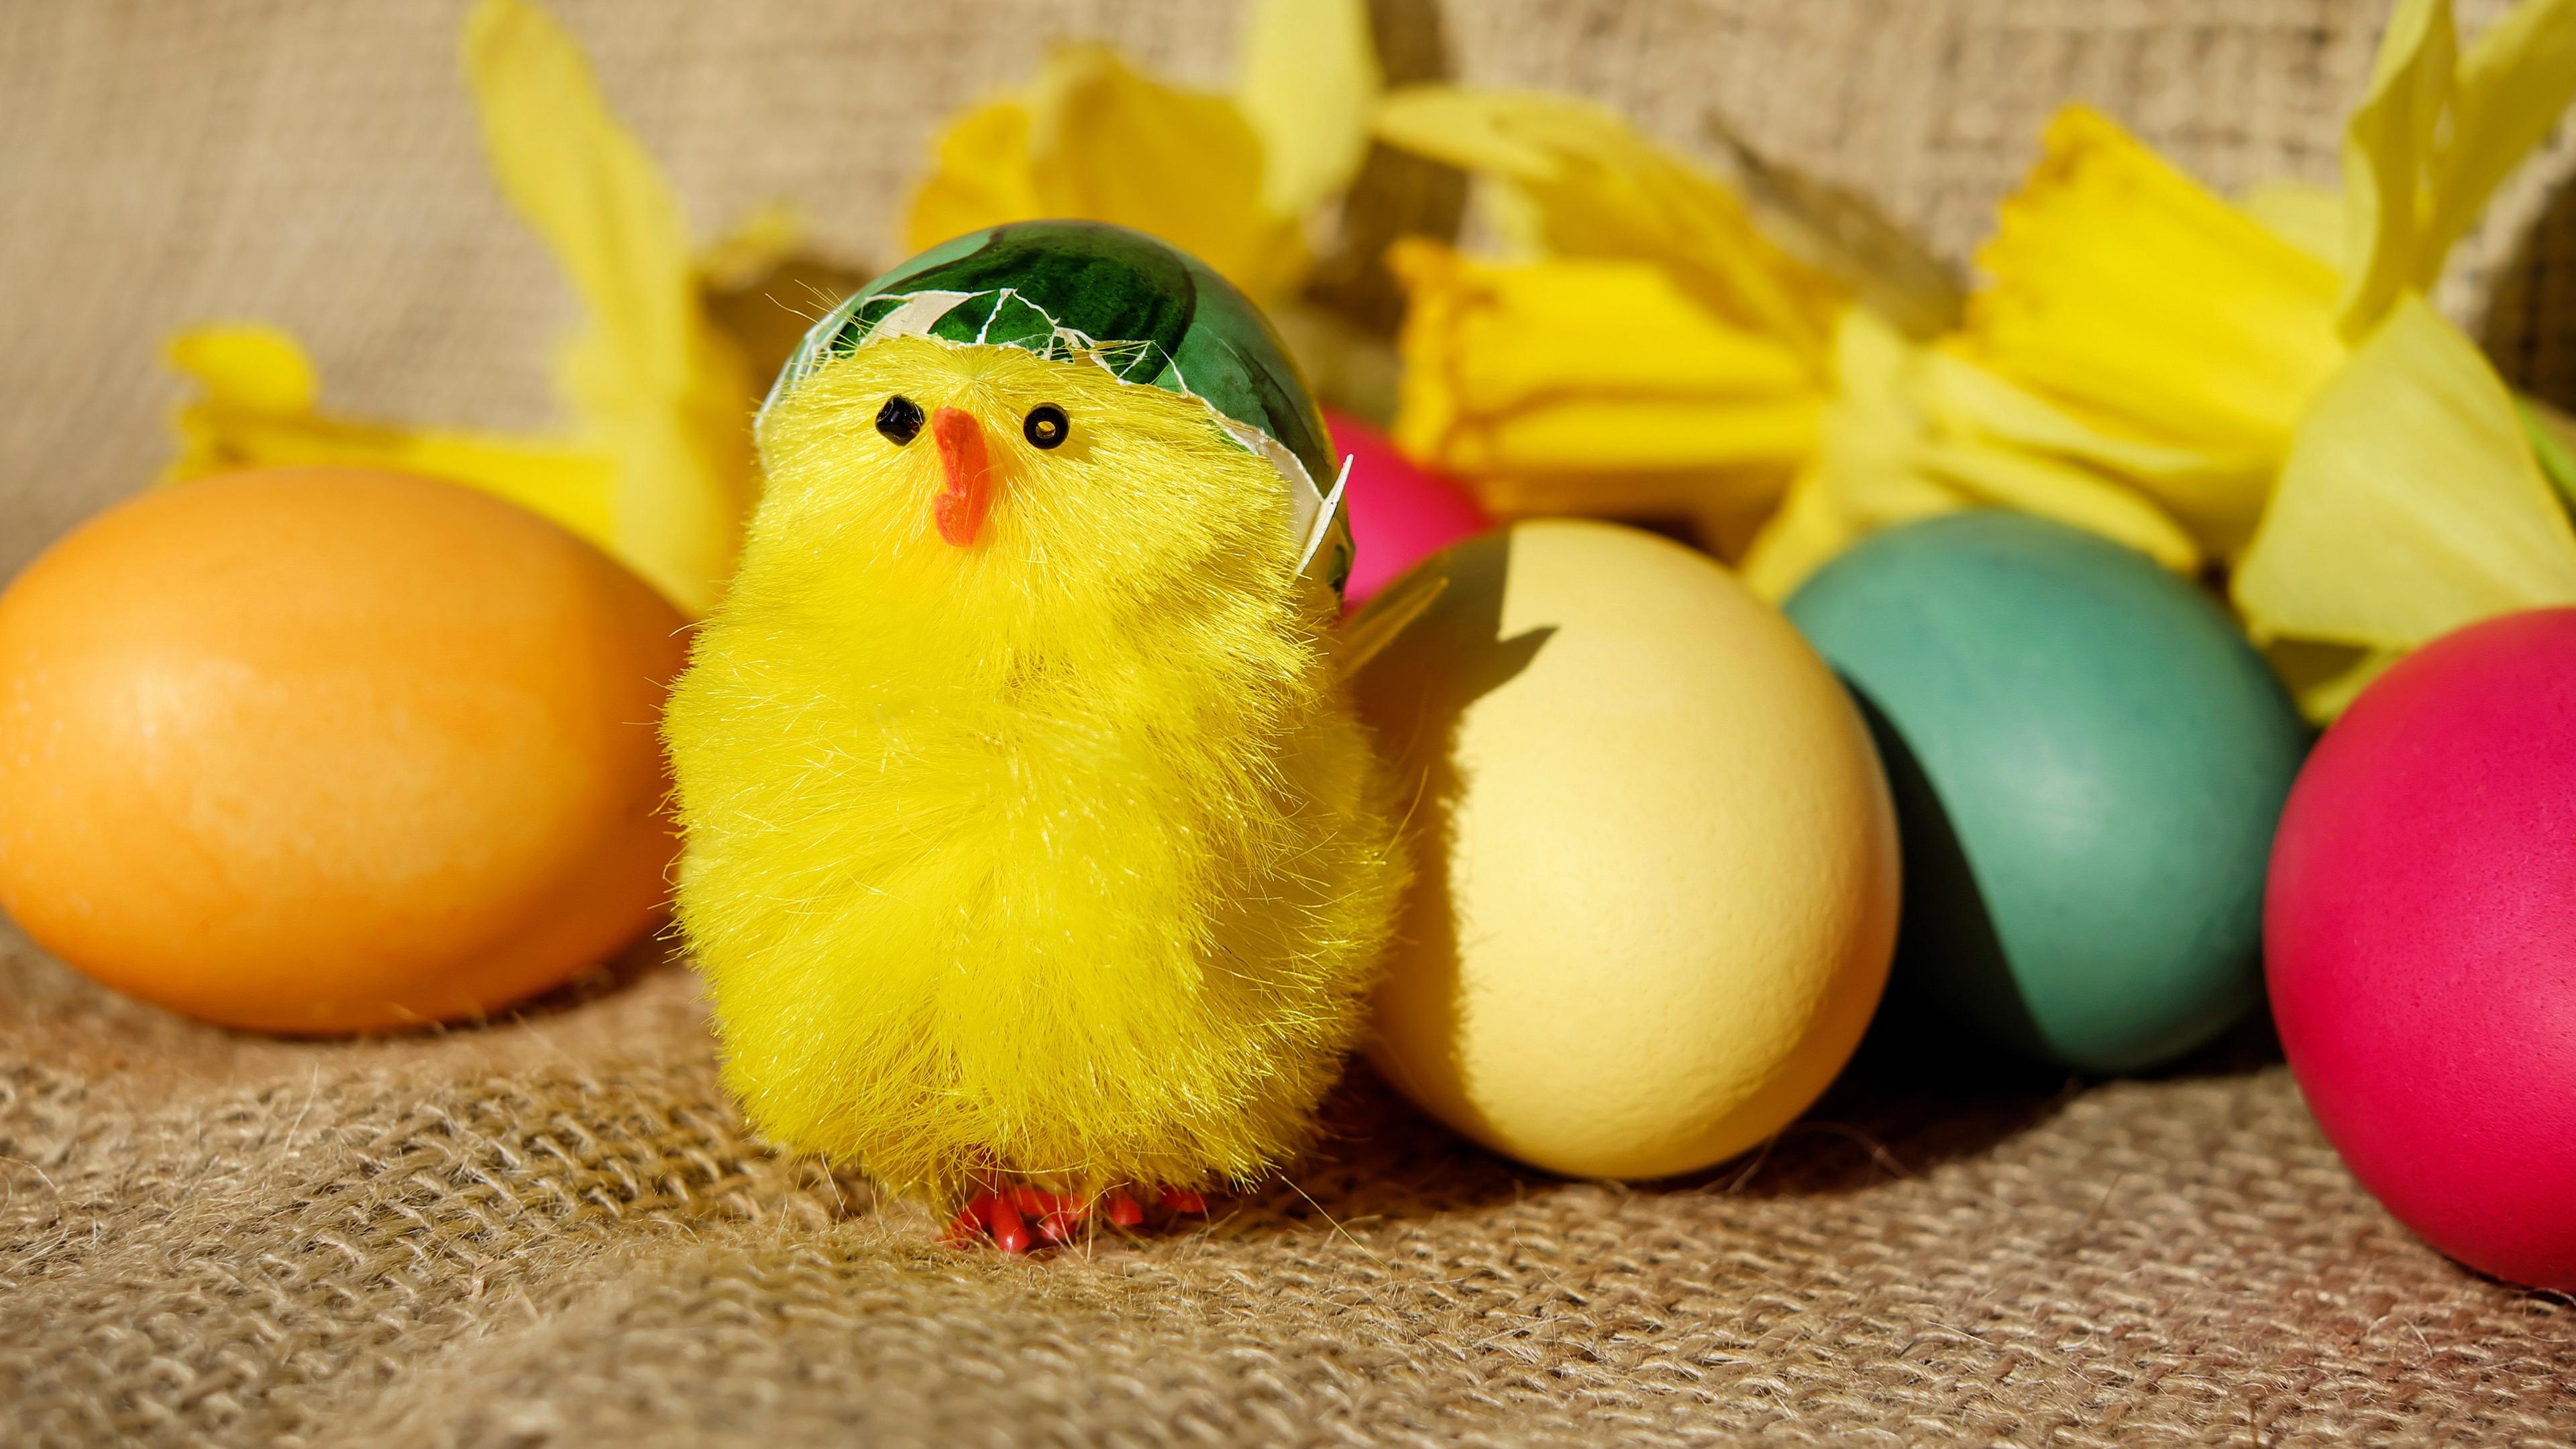 chick eggs easter 4k 1538344990 - chick, eggs, easter 4k - Eggs, Easter, chick